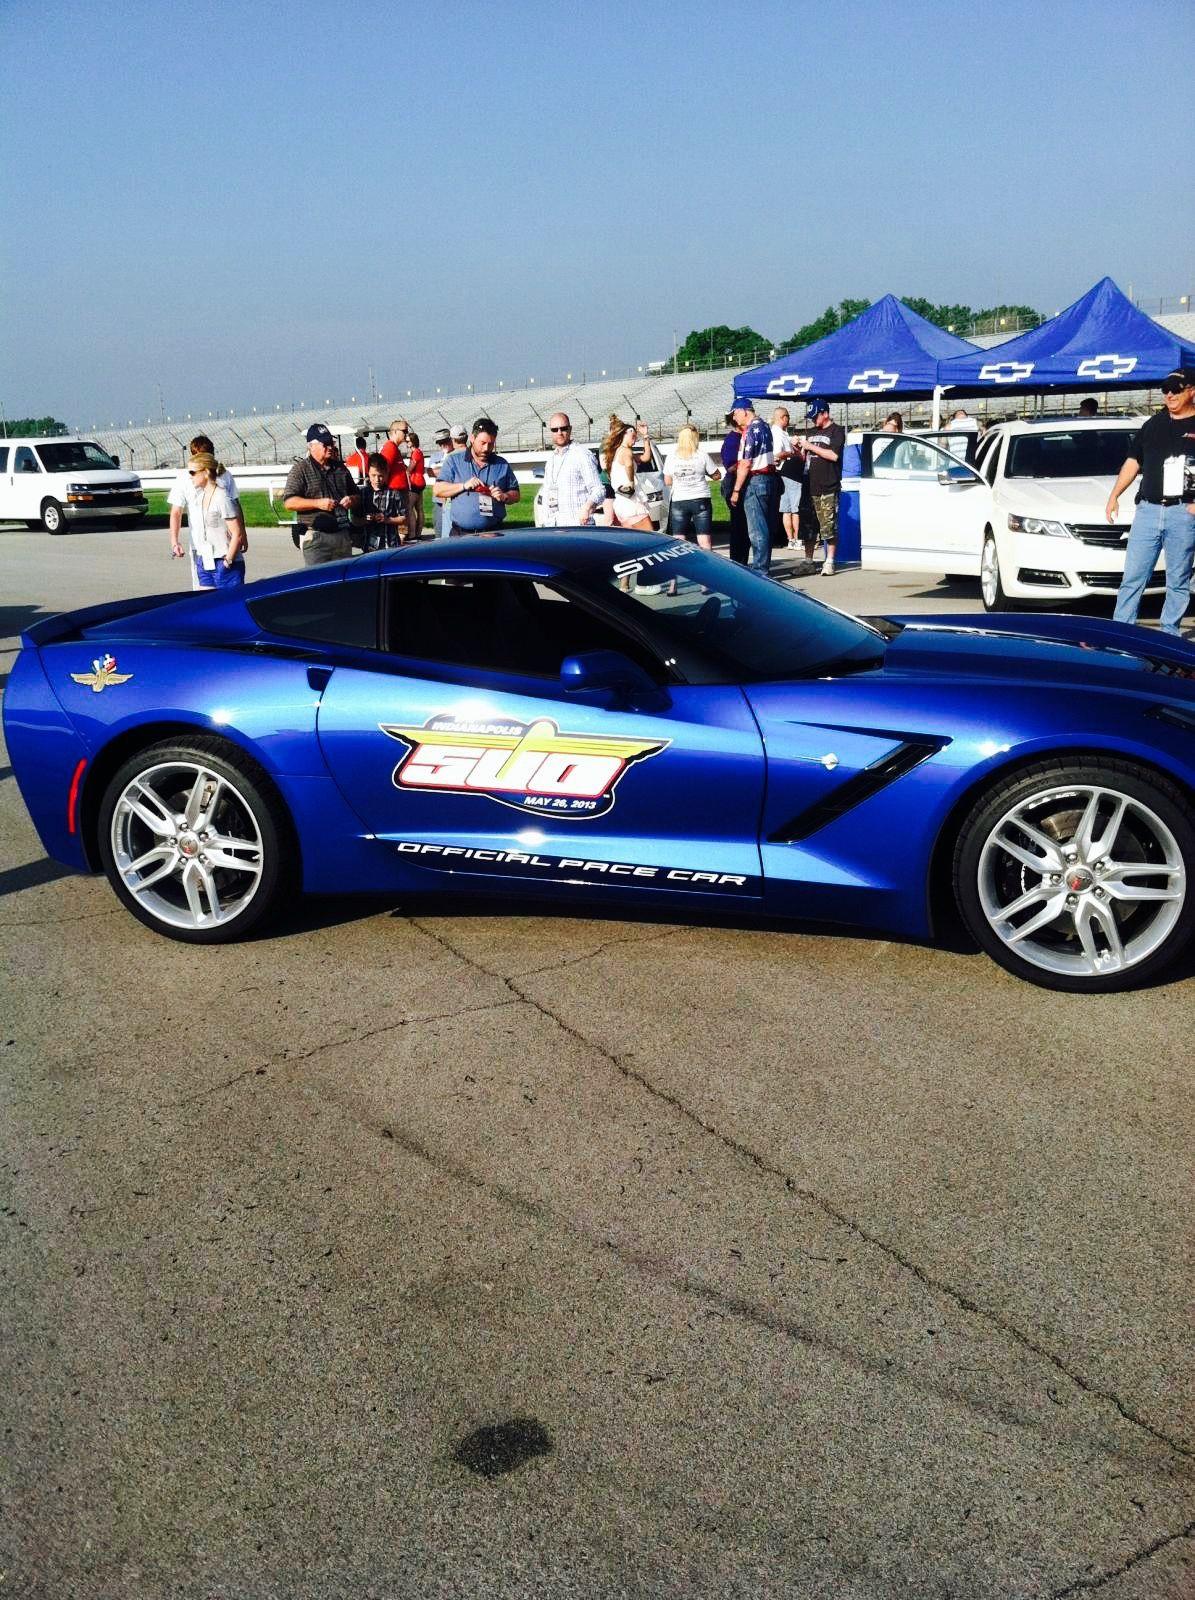 Corvette Pace Car Indianapolis 500 Corvette Stingray Corvette